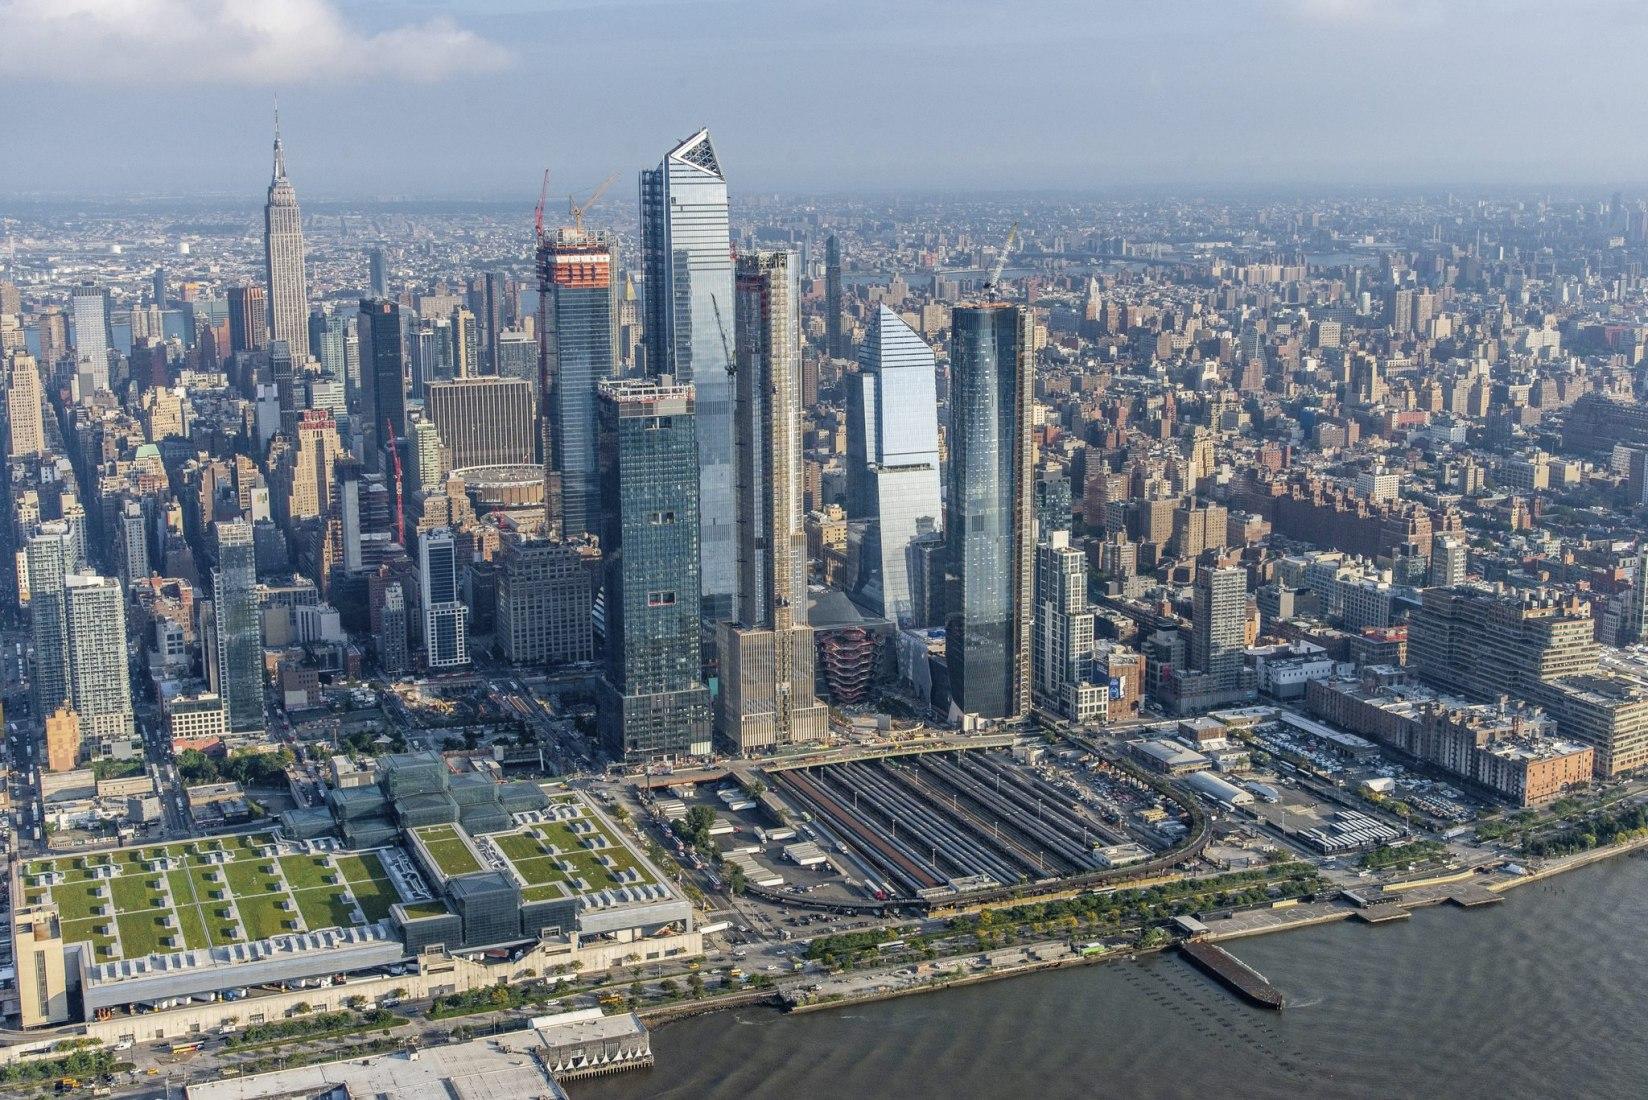 Thomas Heatherwick's NYC installation. Photograph by Hudson Yards New York, courtesy of Hudson Yards New York